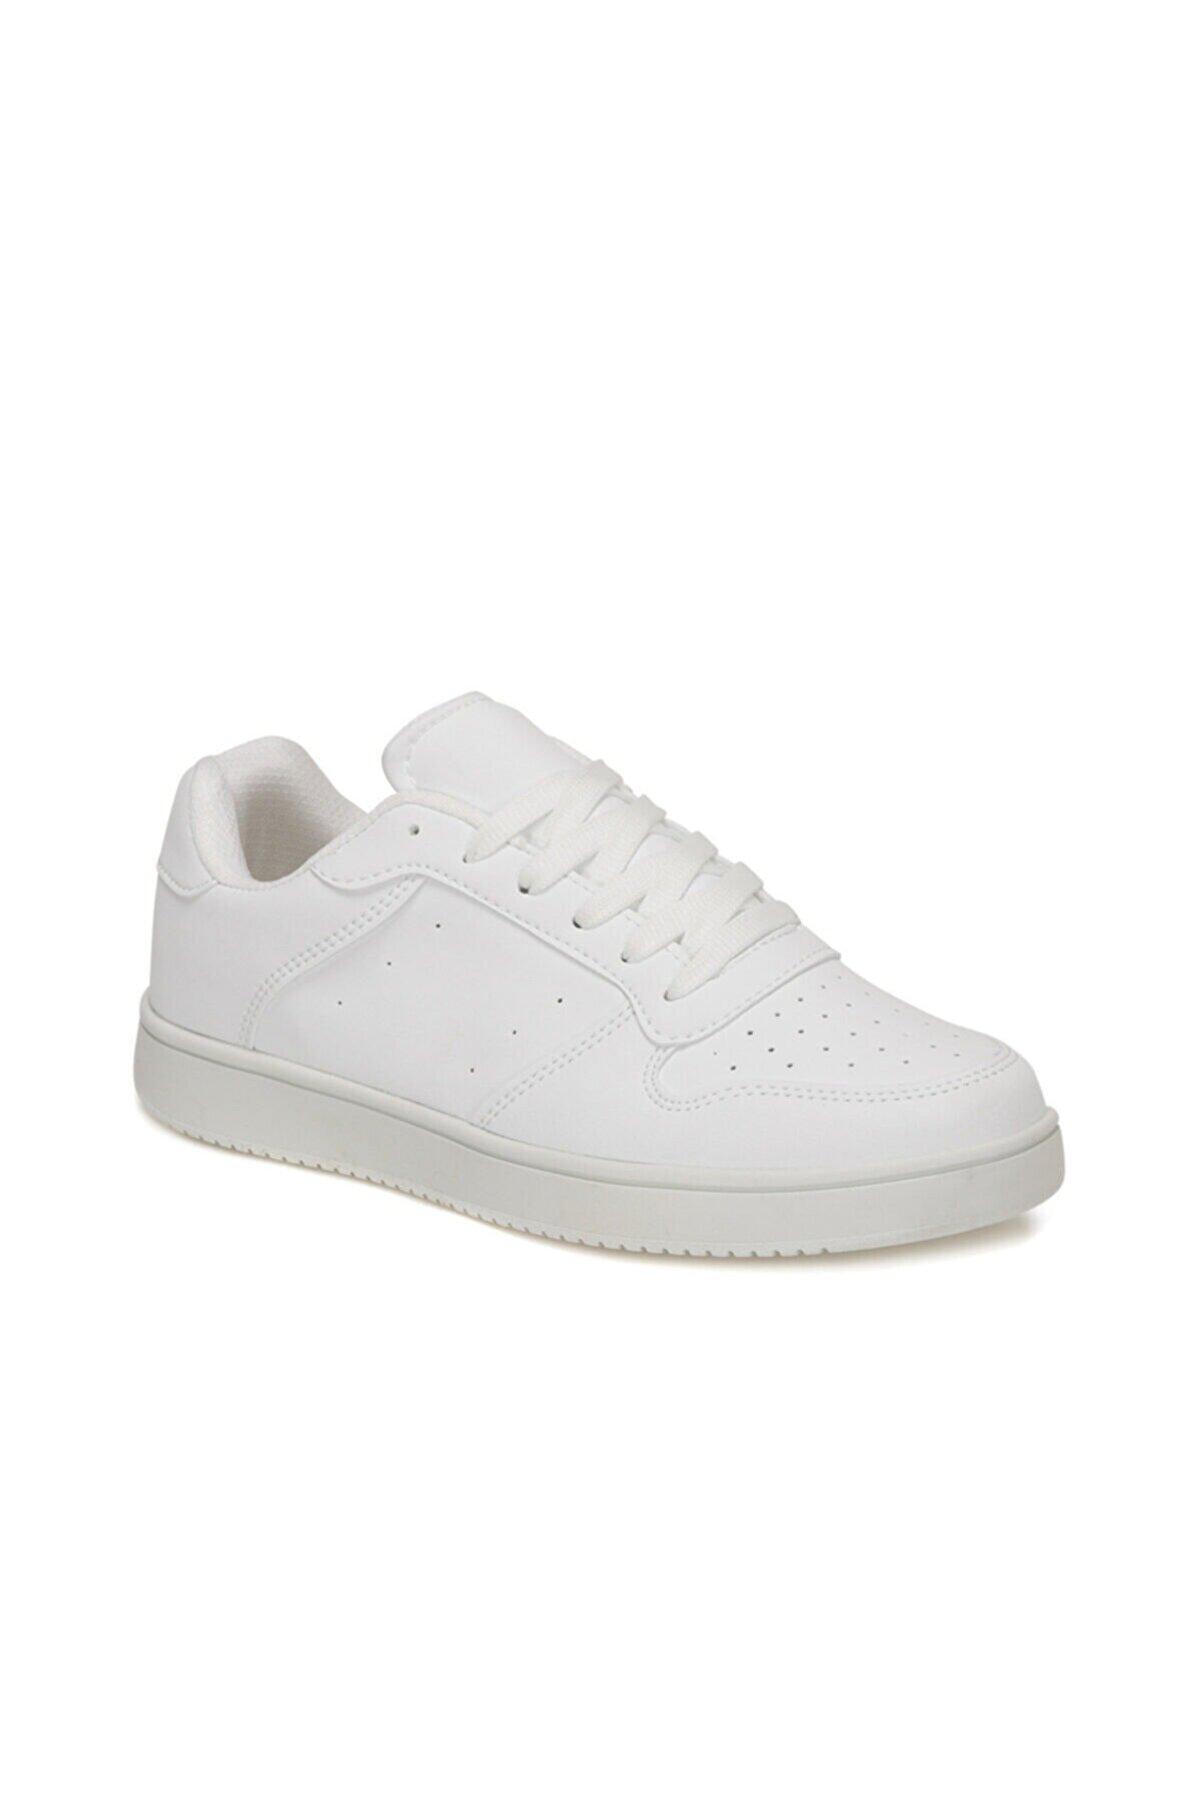 Torex Forest Beyaz Erkek Çocuk Sneaker